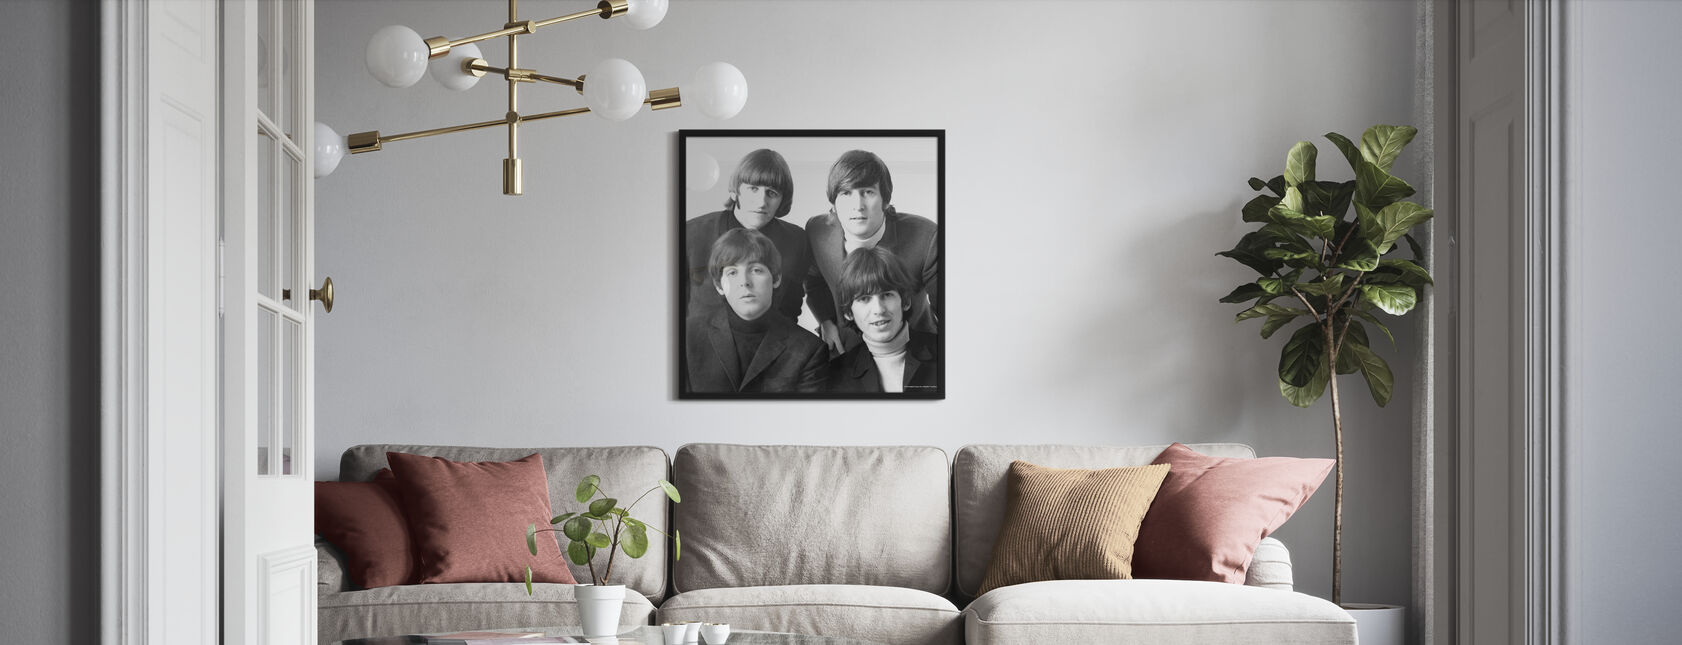 Beatles - Juliste - Olohuone